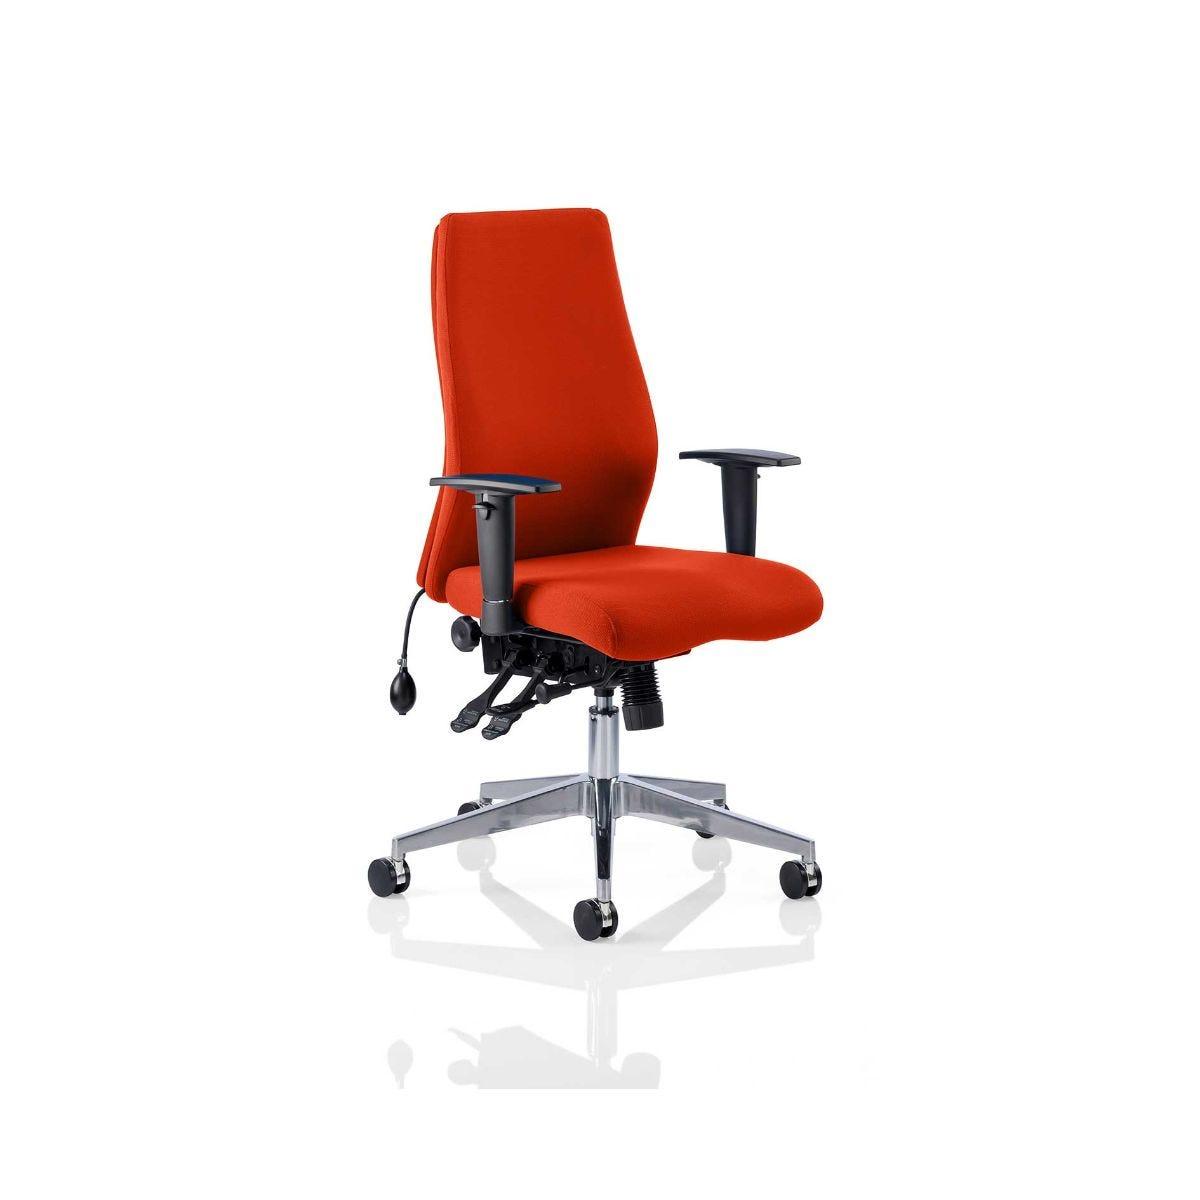 Onyx Bespoke Office Chair, Pimento